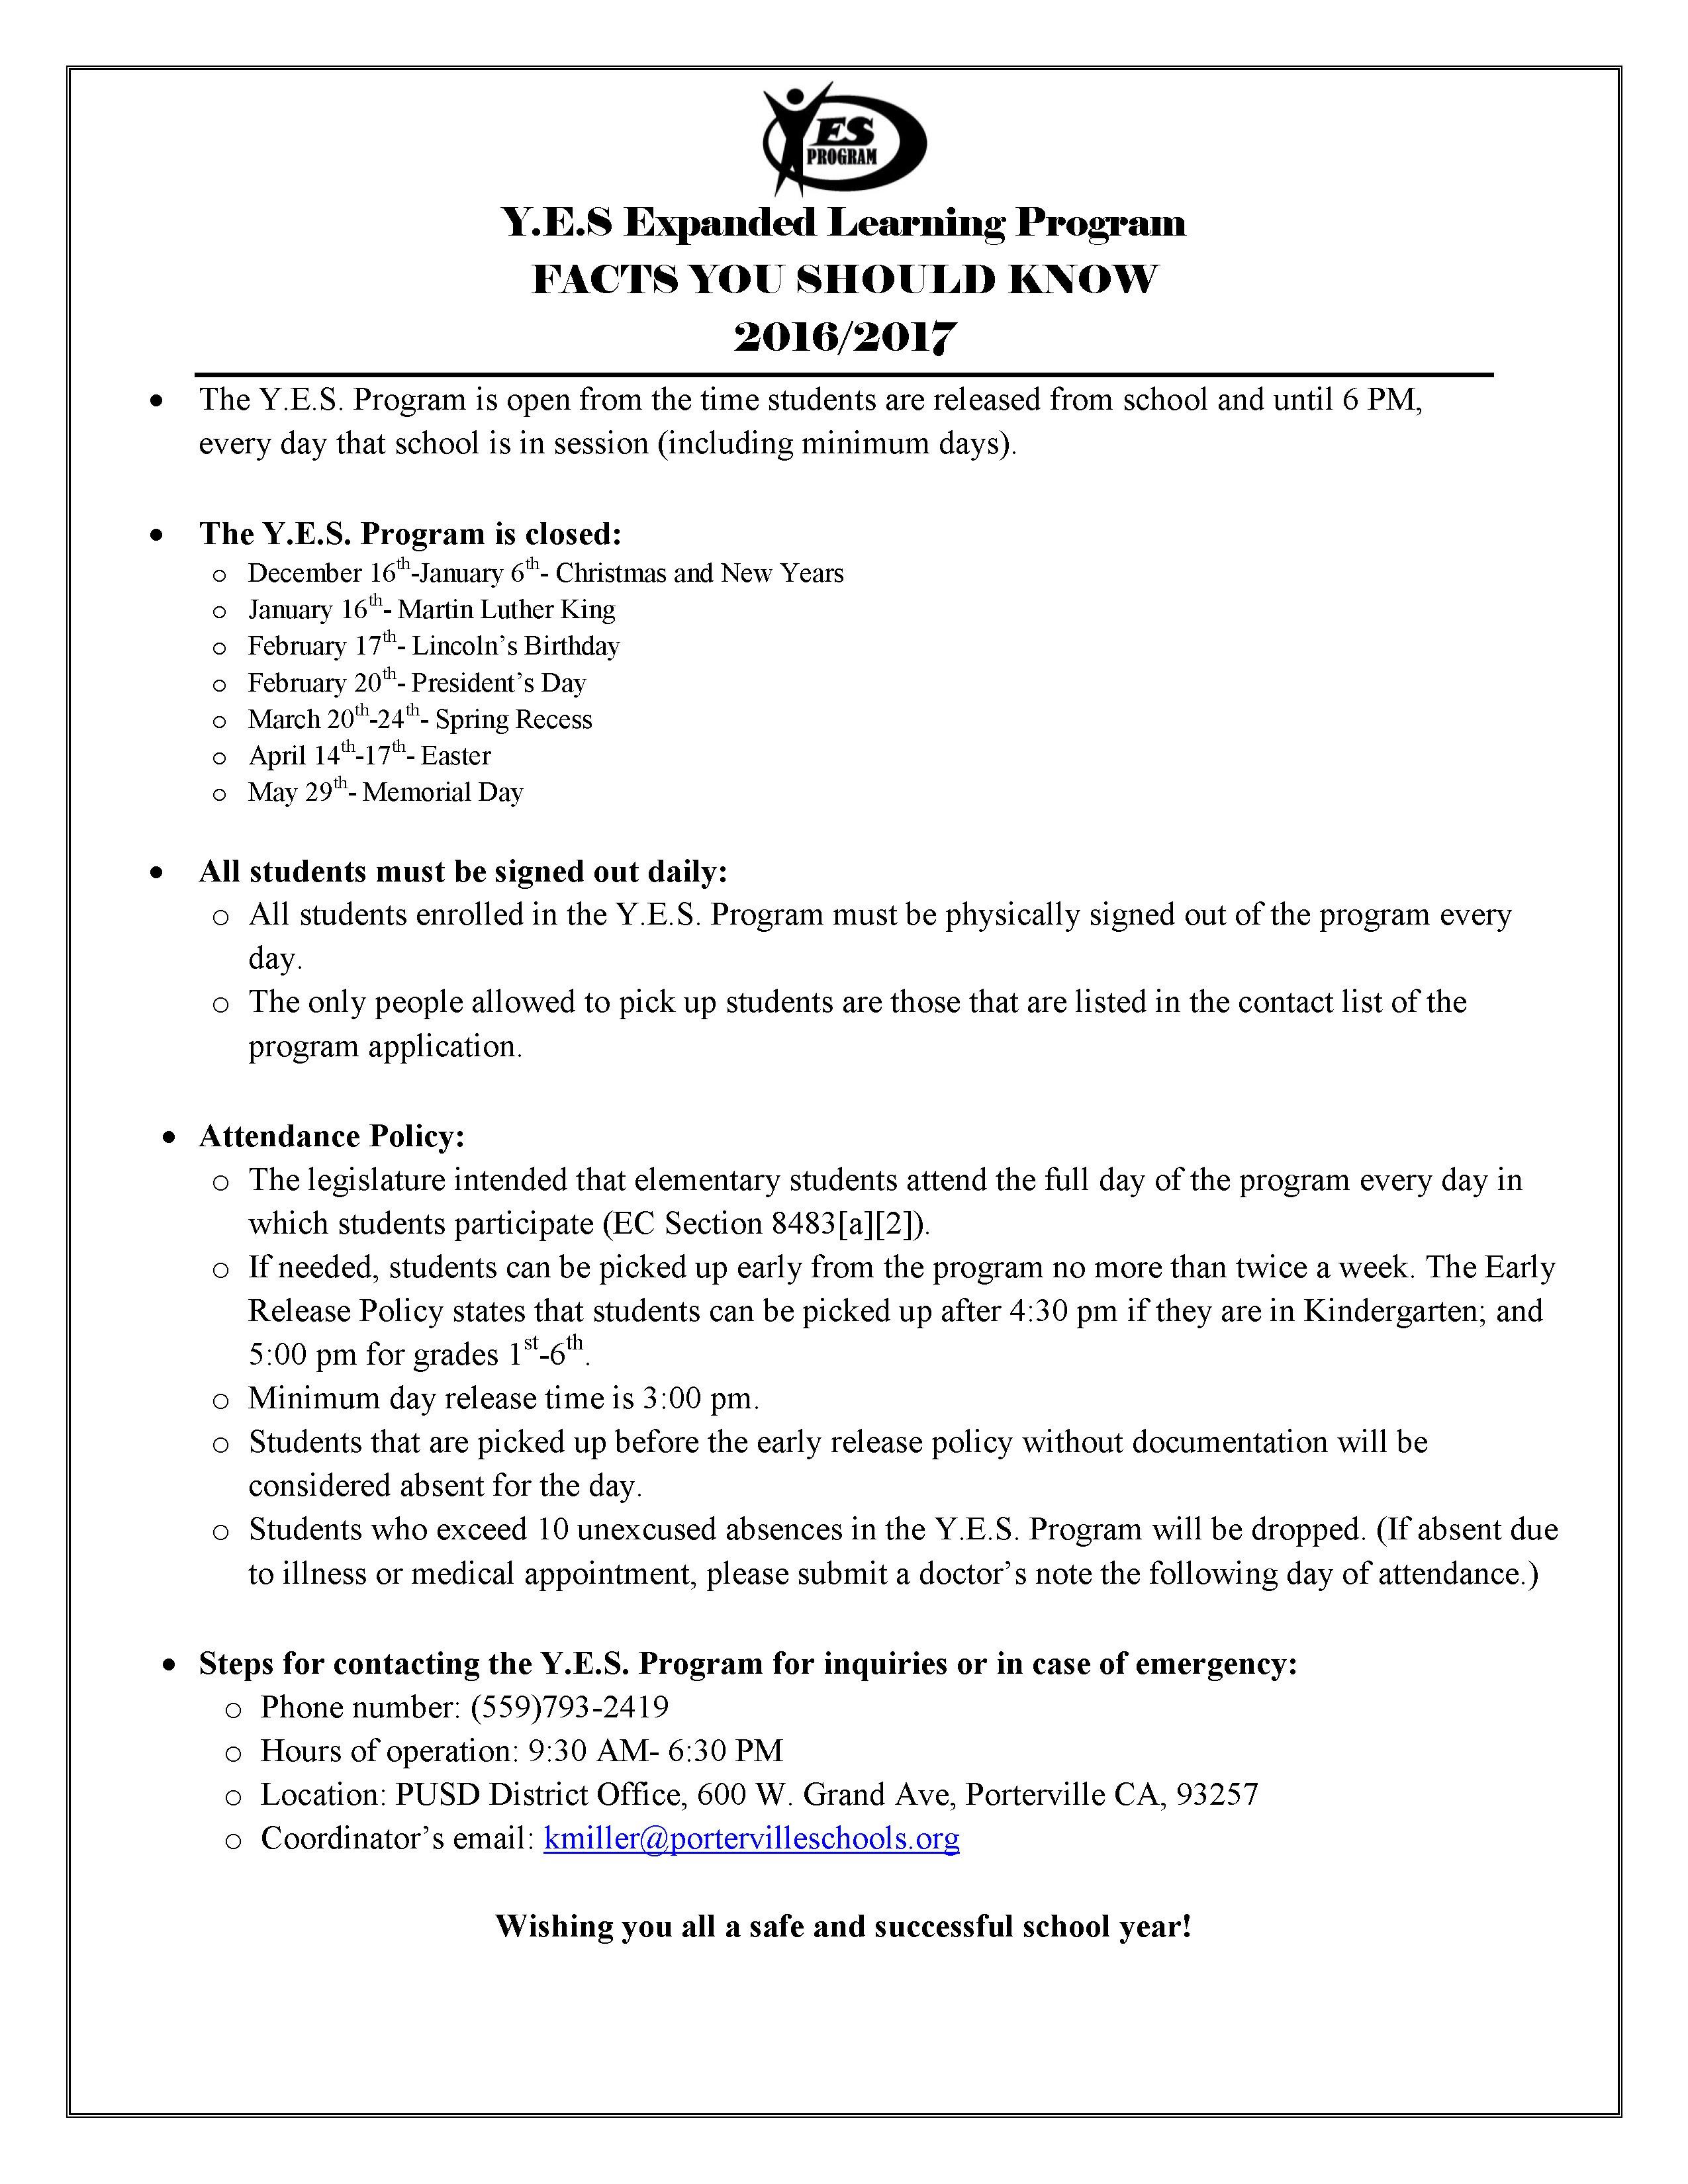 YES Program Facts (English)